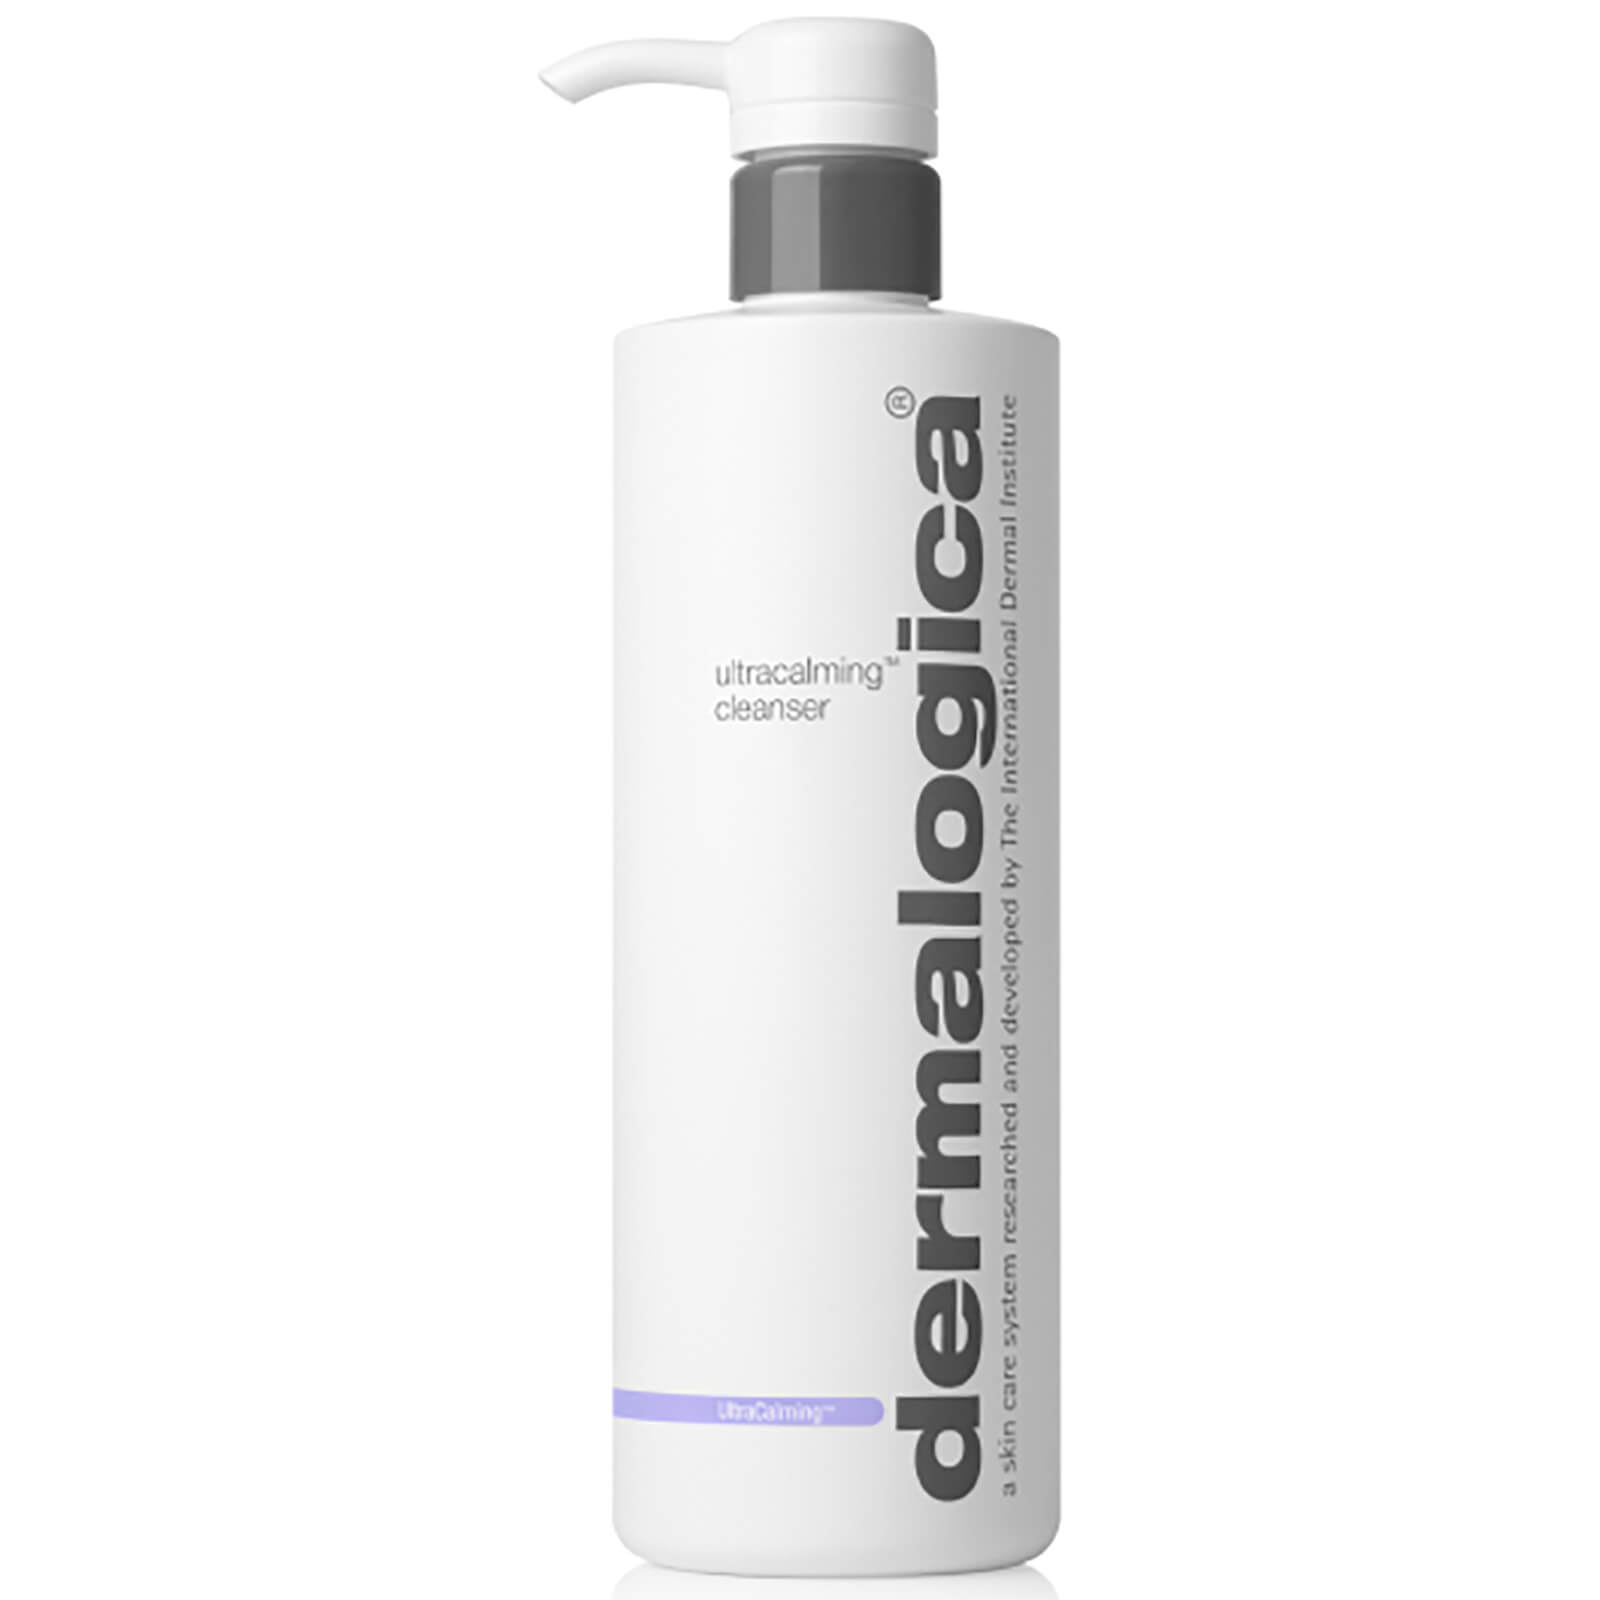 ultracalming cleanser 500 ml